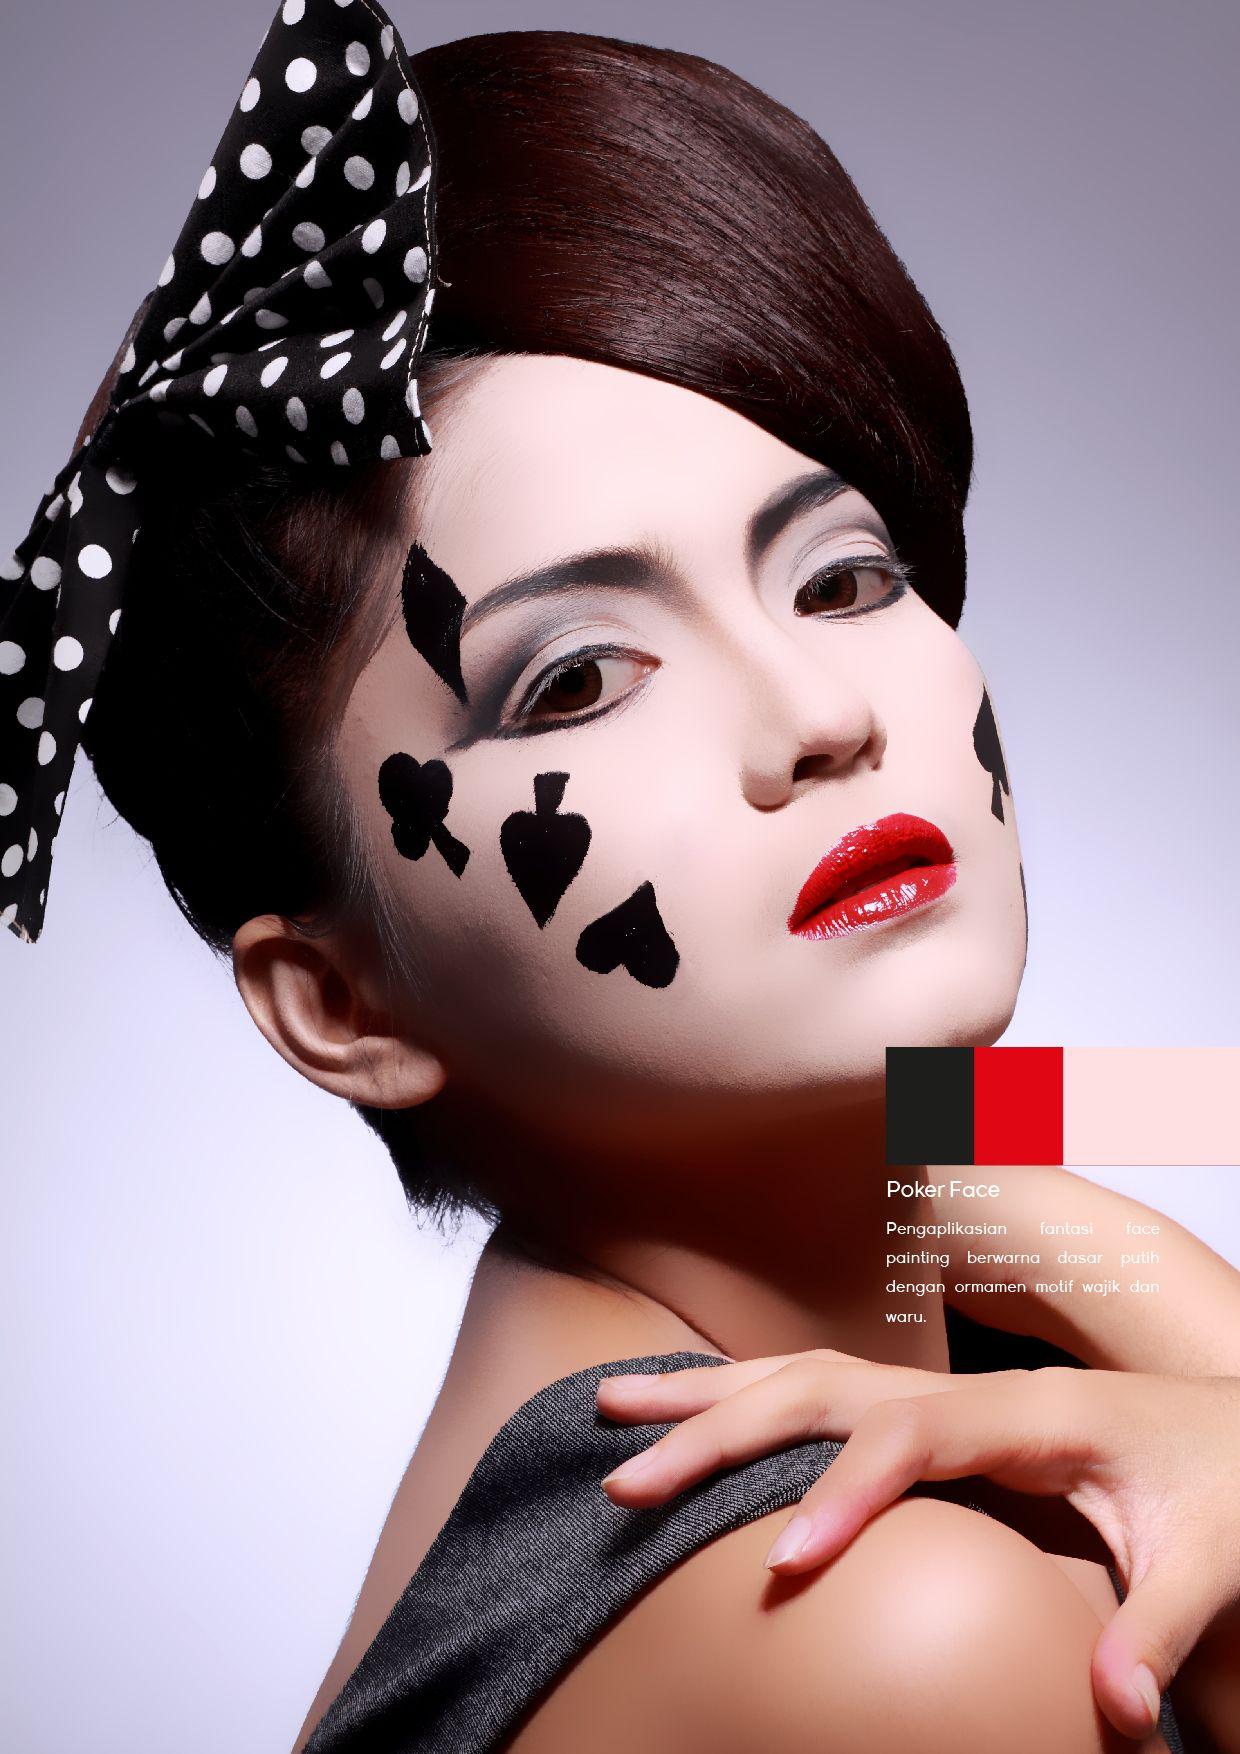 poker face makeup conceptual beauty conceptual make up pinterest fasching spielkarten. Black Bedroom Furniture Sets. Home Design Ideas